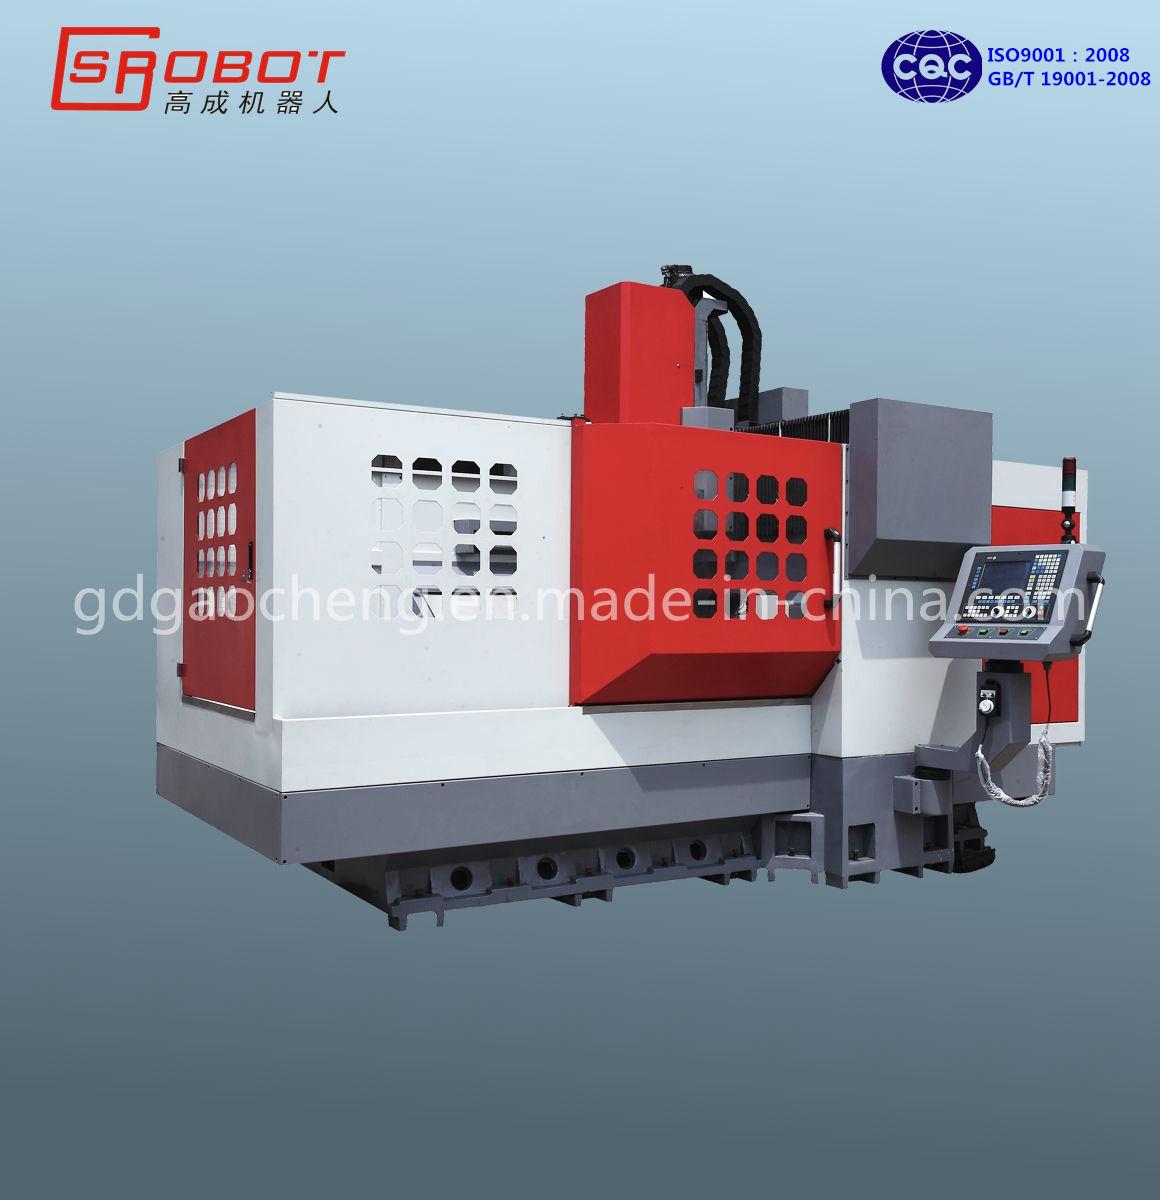 Large Grantry CNC Vertical Machine Center